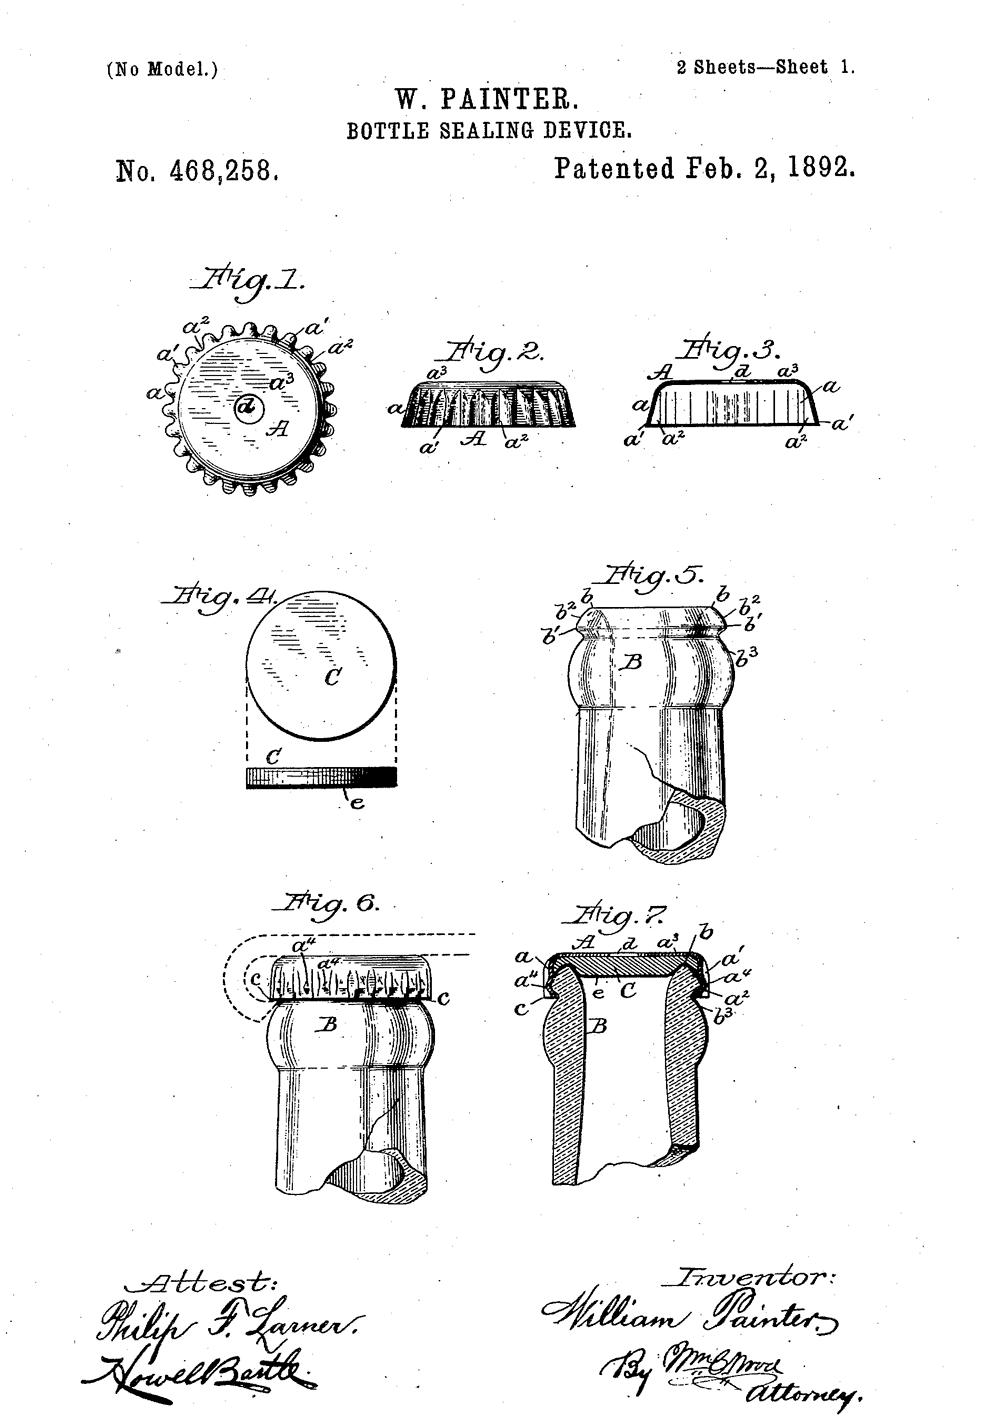 Ilustracja patentu Wiliama Paintera nakapsel o24 ząbkach